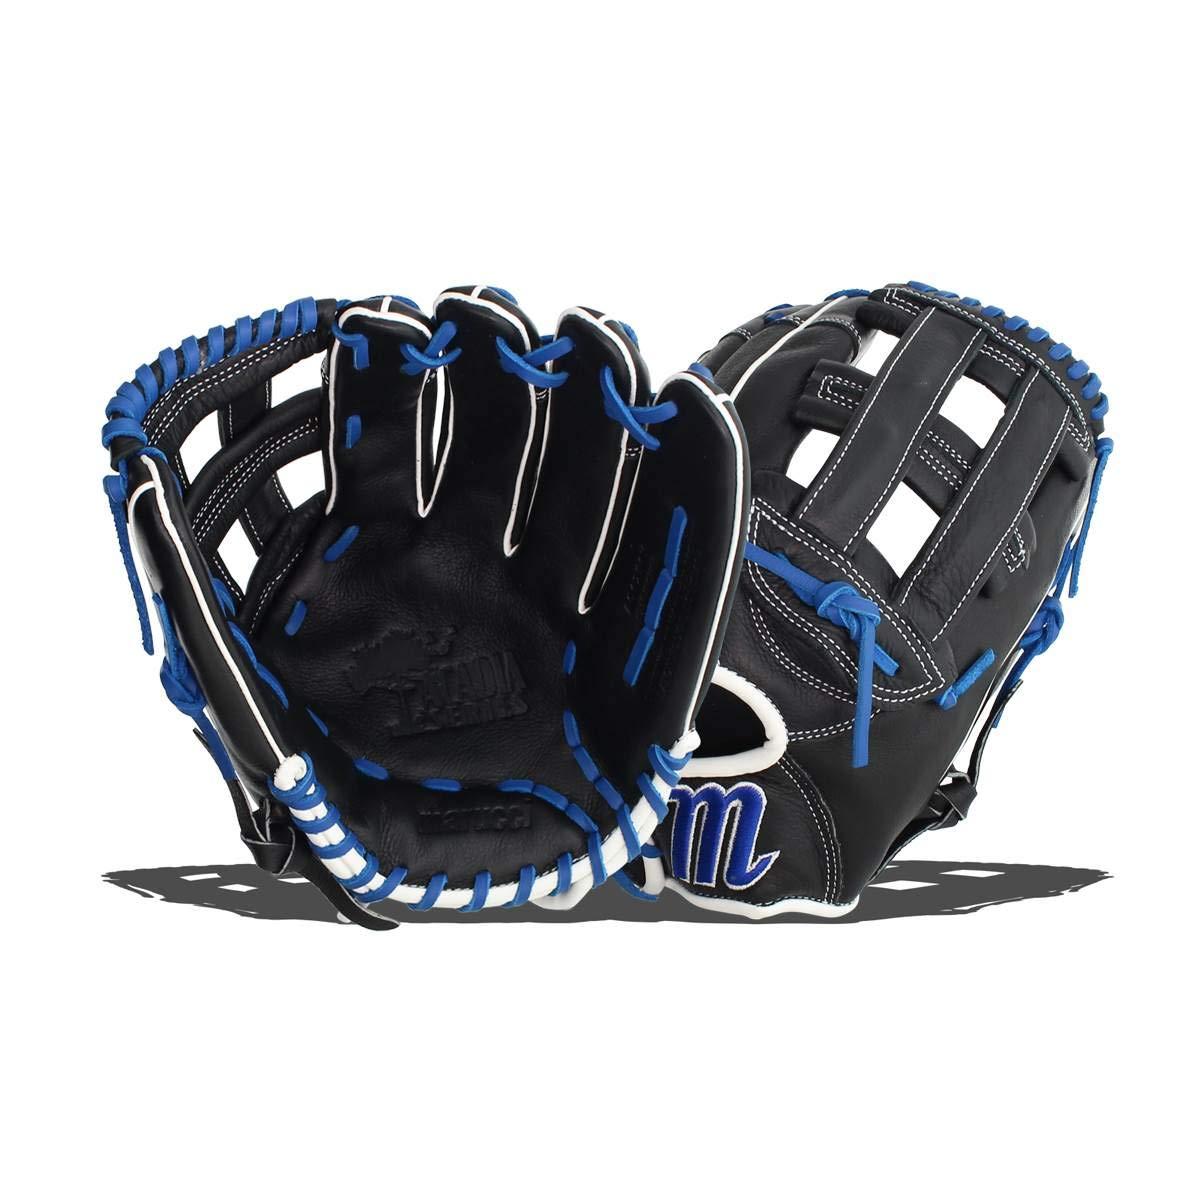 Marucci Acadia Series 12.50 Baseball Glove MFGAC125Y MFGAC125Y-BK//RB